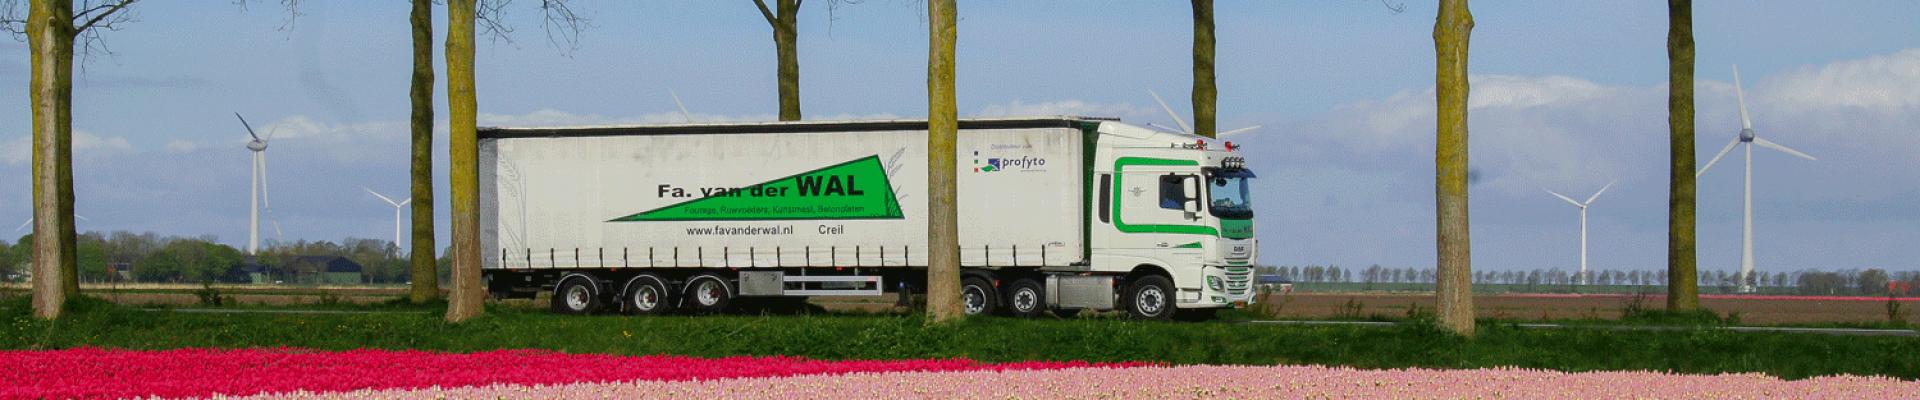 Fa van der Wal Fourage cover foto